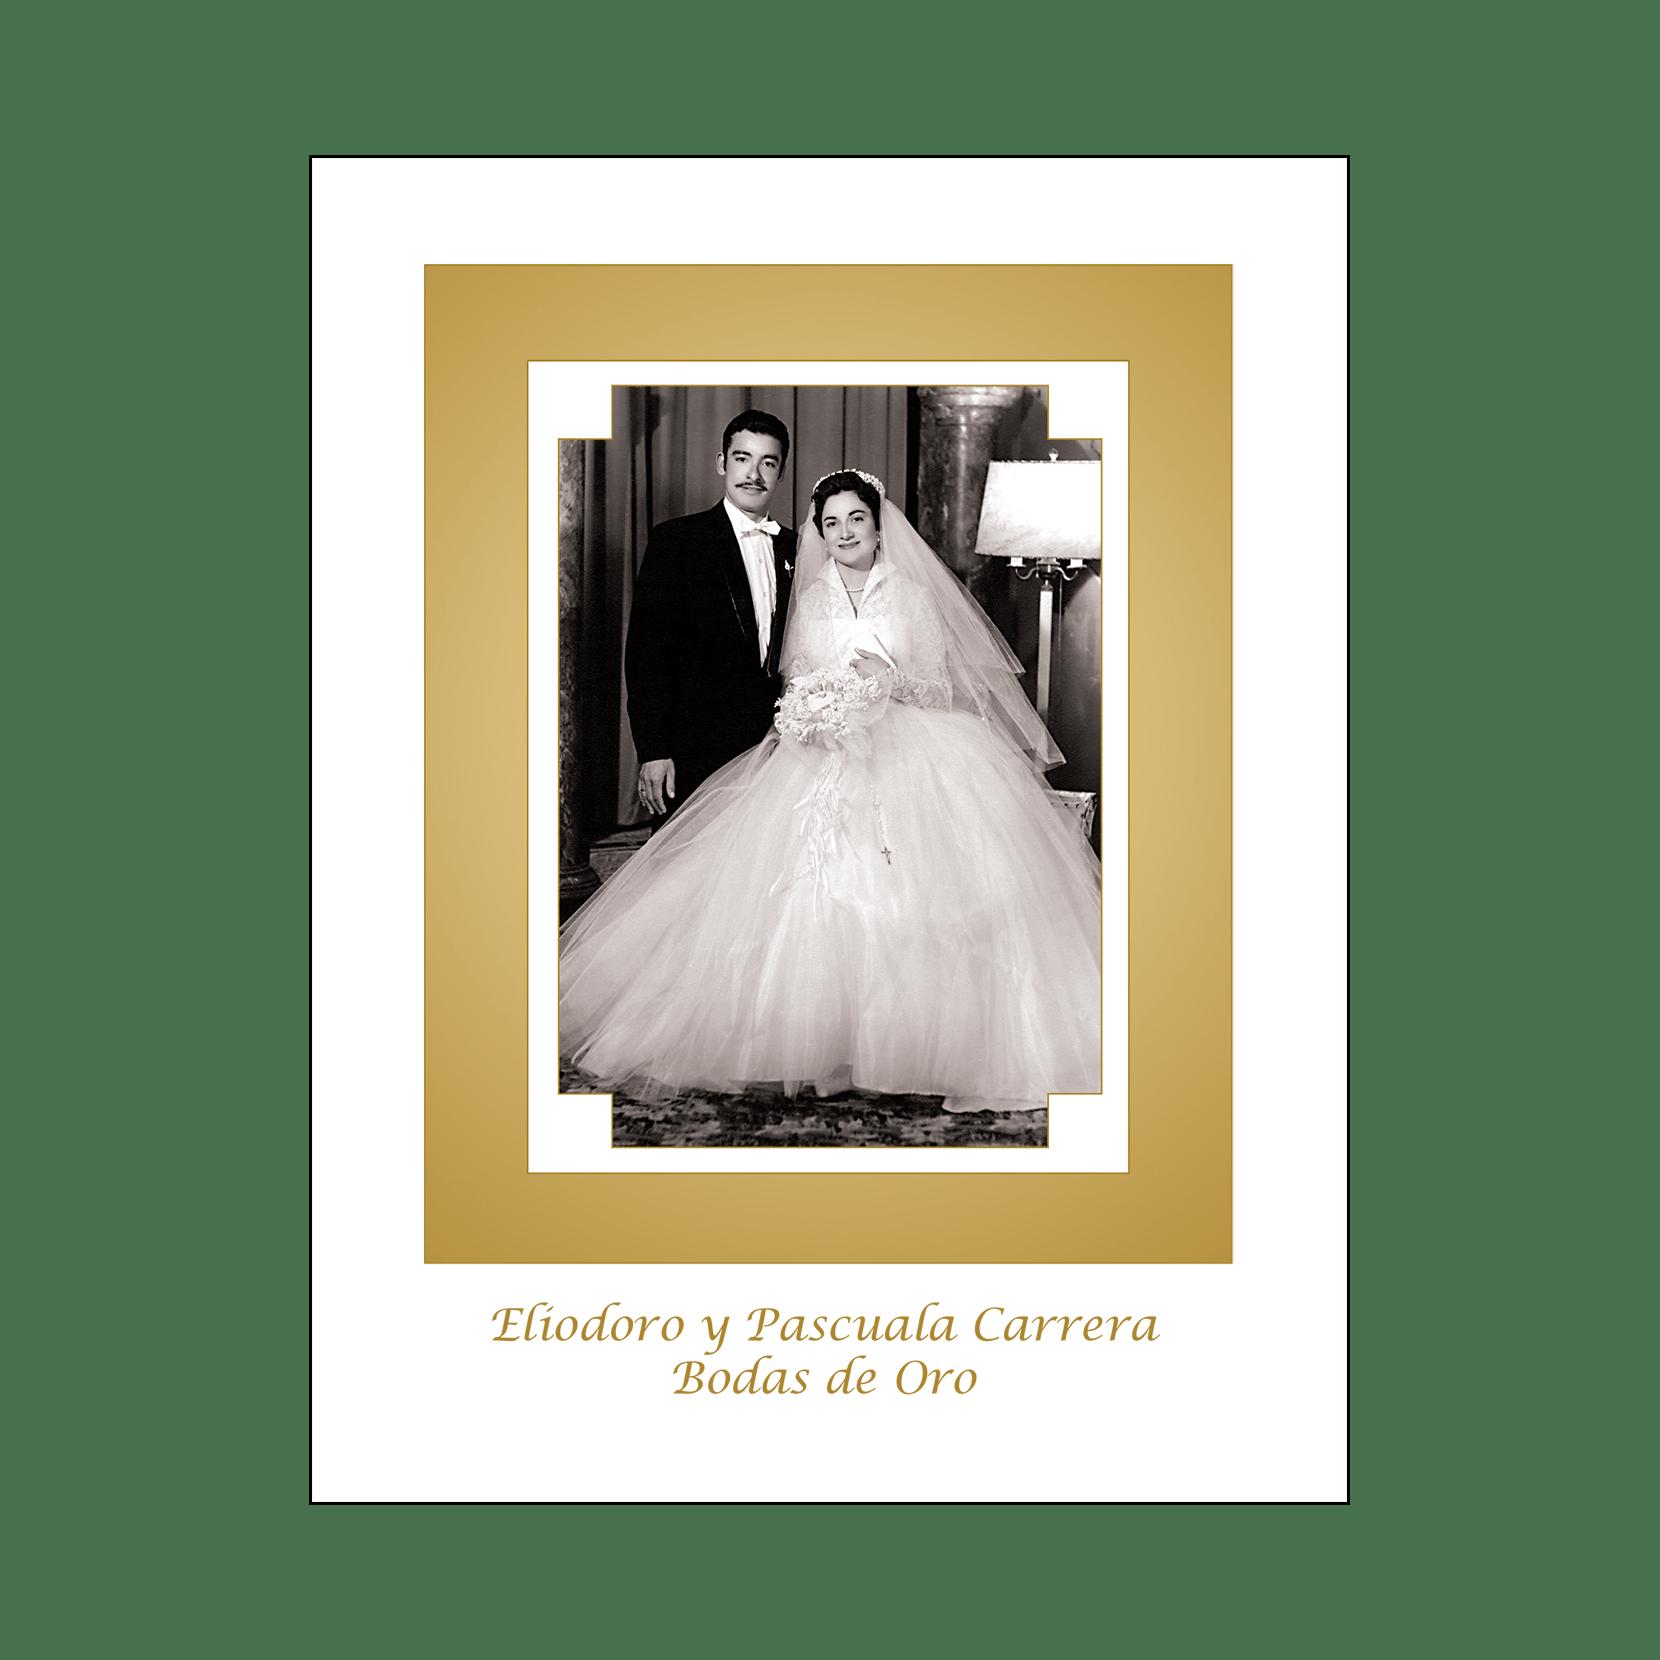 Spanish Wedding Anniversary Party Invitation, Style 1R – IPV Studio